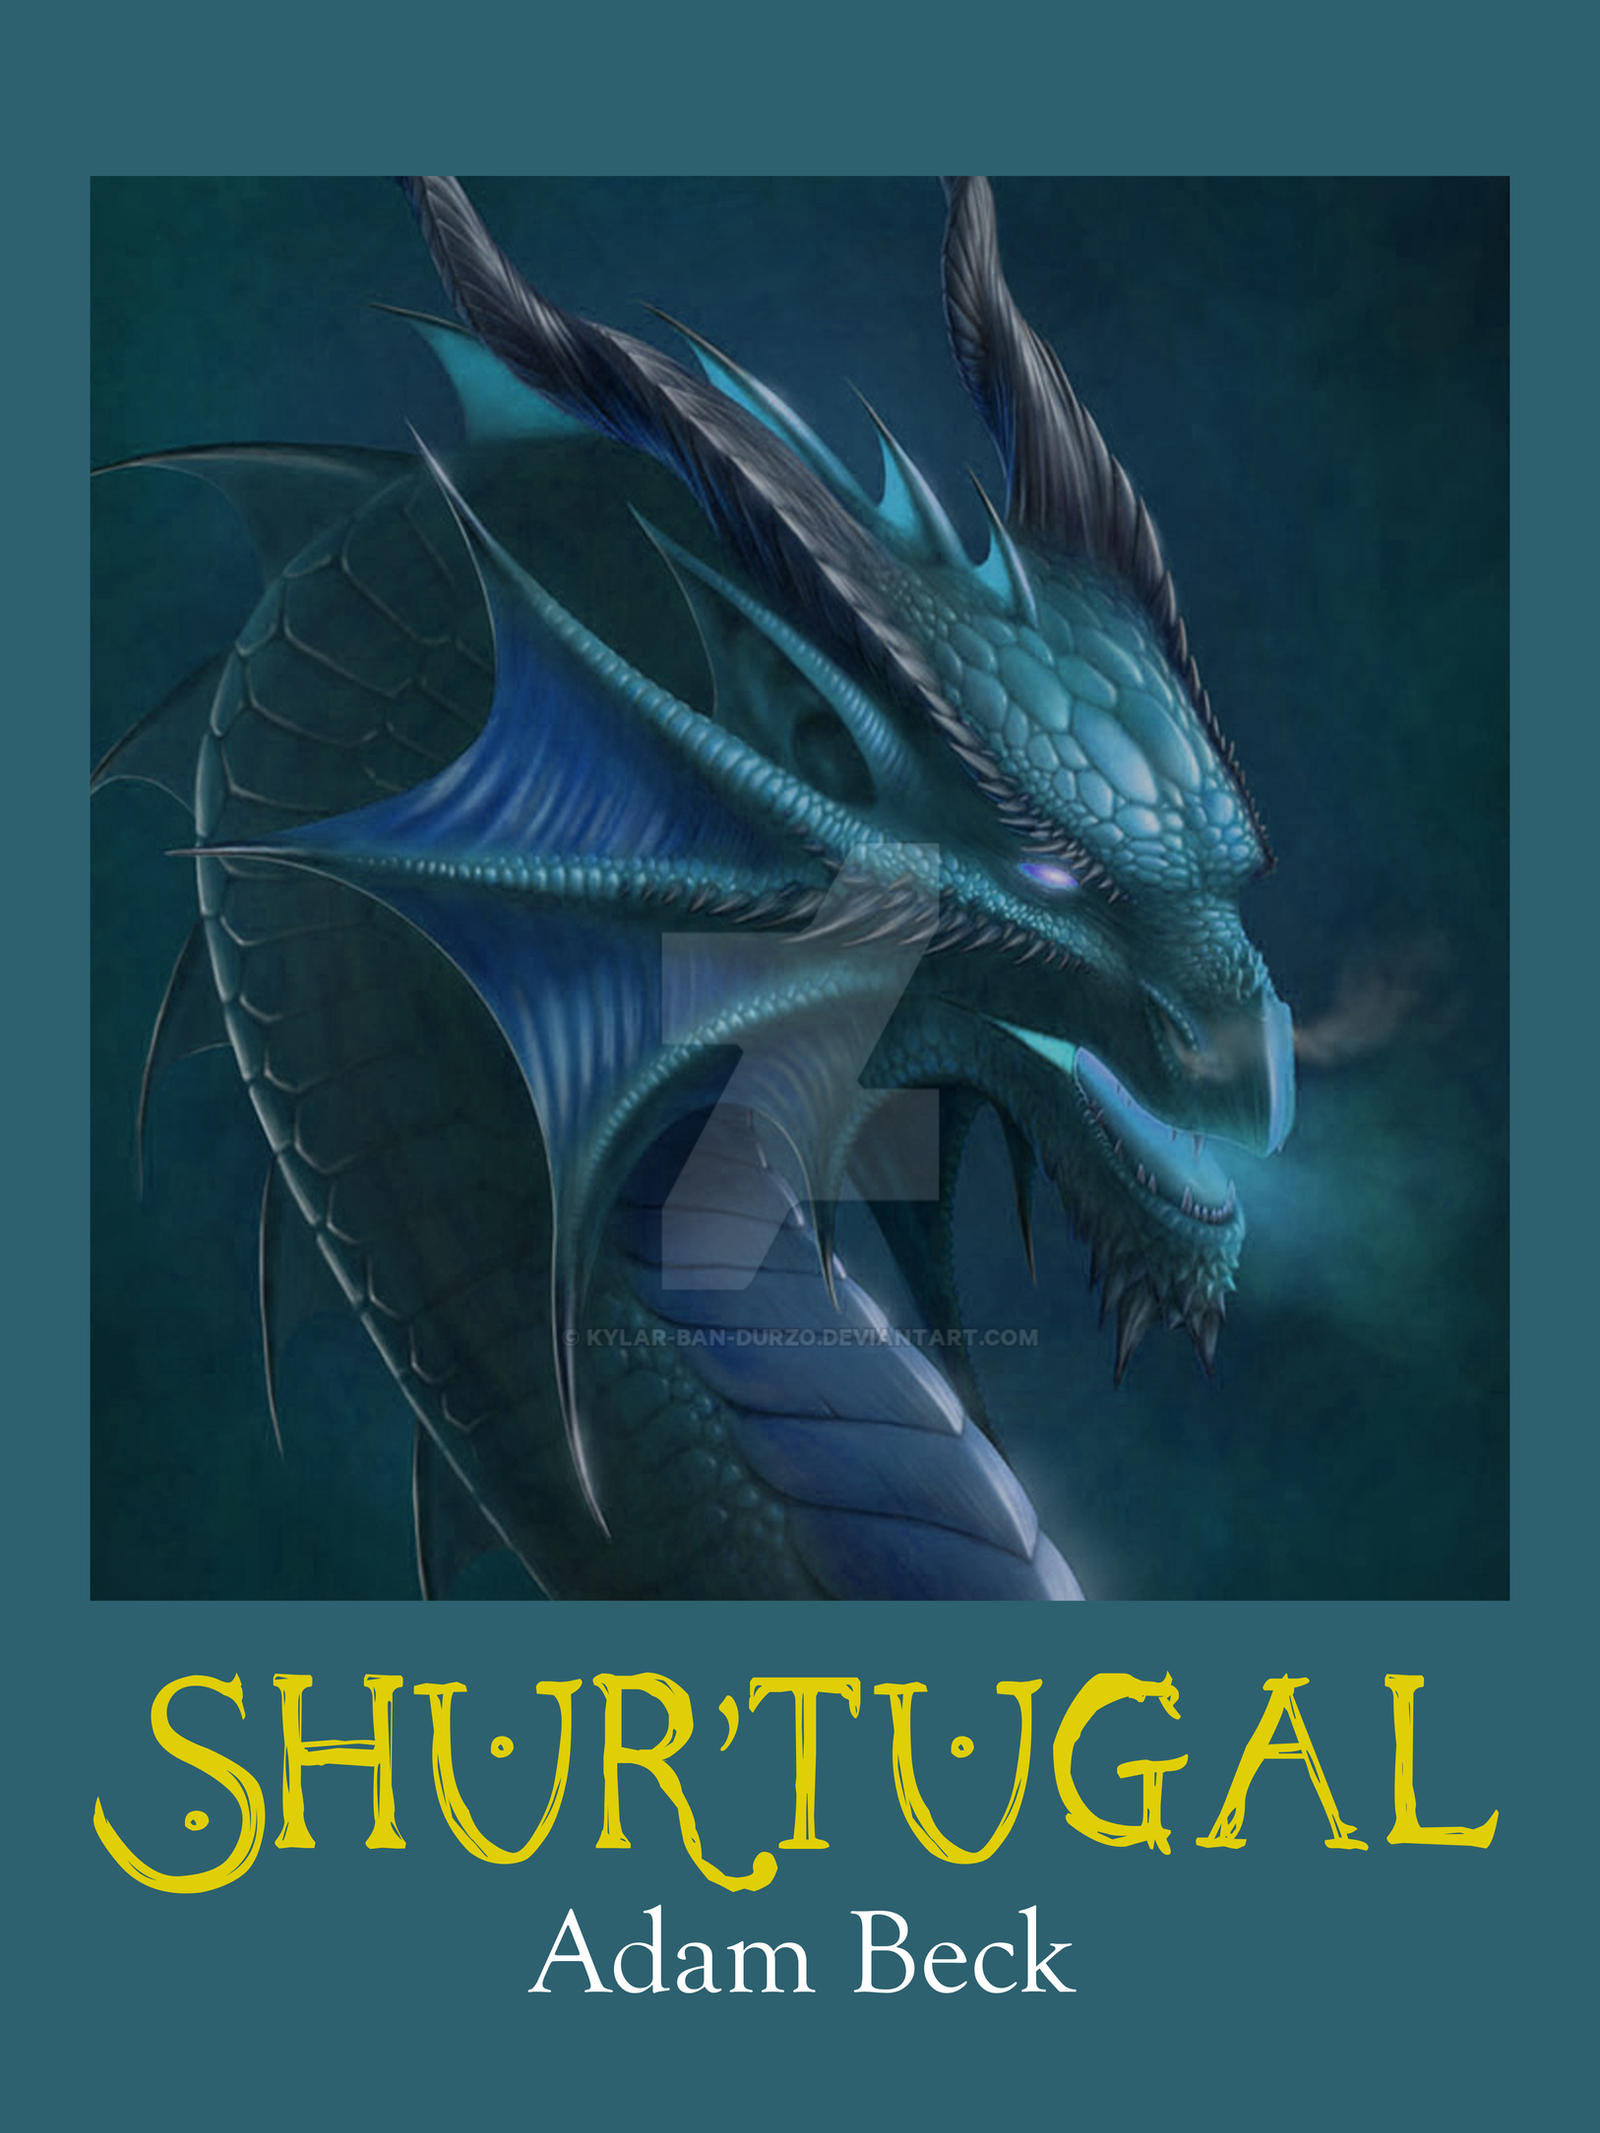 Eragon Book Cover Art : Inheritance book v cover by kylar ban durzo on deviantart